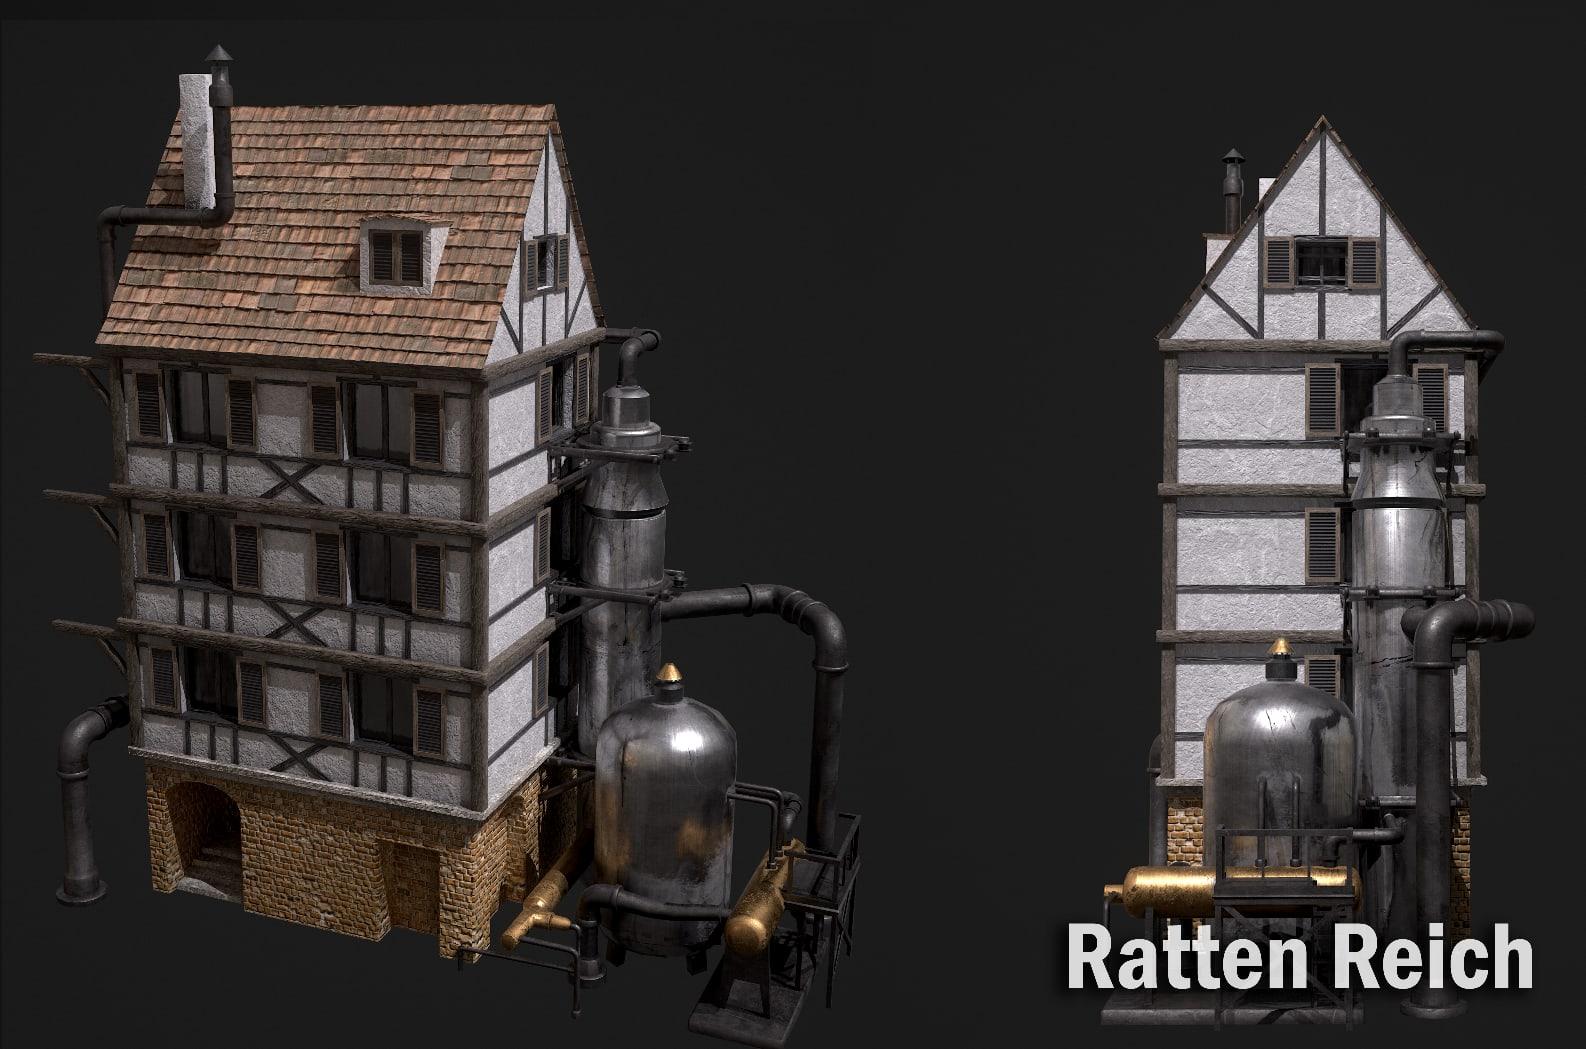 Ratten Reich building